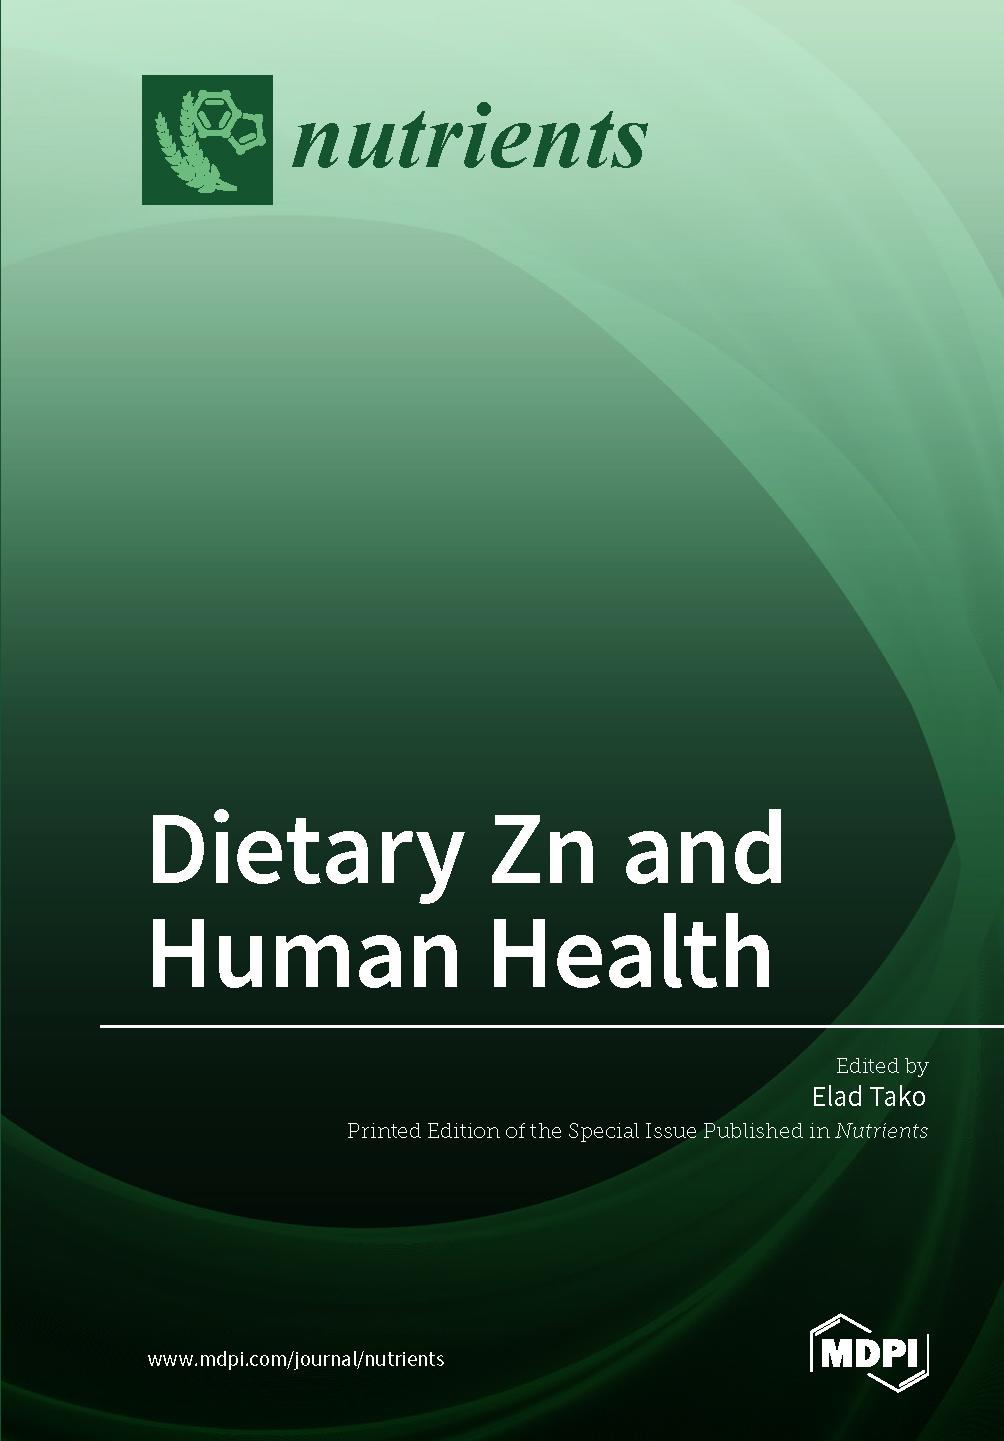 Dietary Zn and Human Health